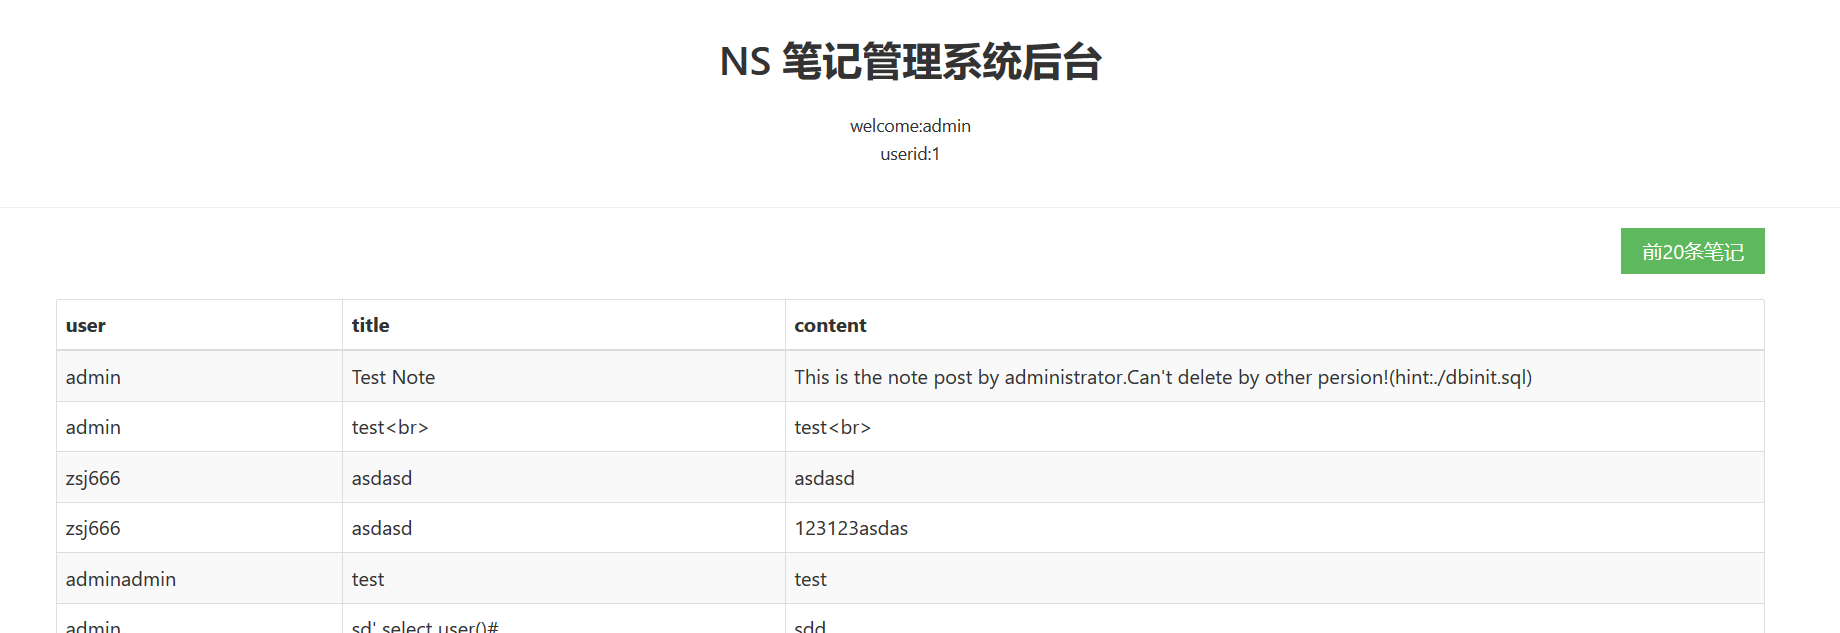 whaleCTF Medium 30Days WEB 总结-ShaoBaoBaoEr's Blog